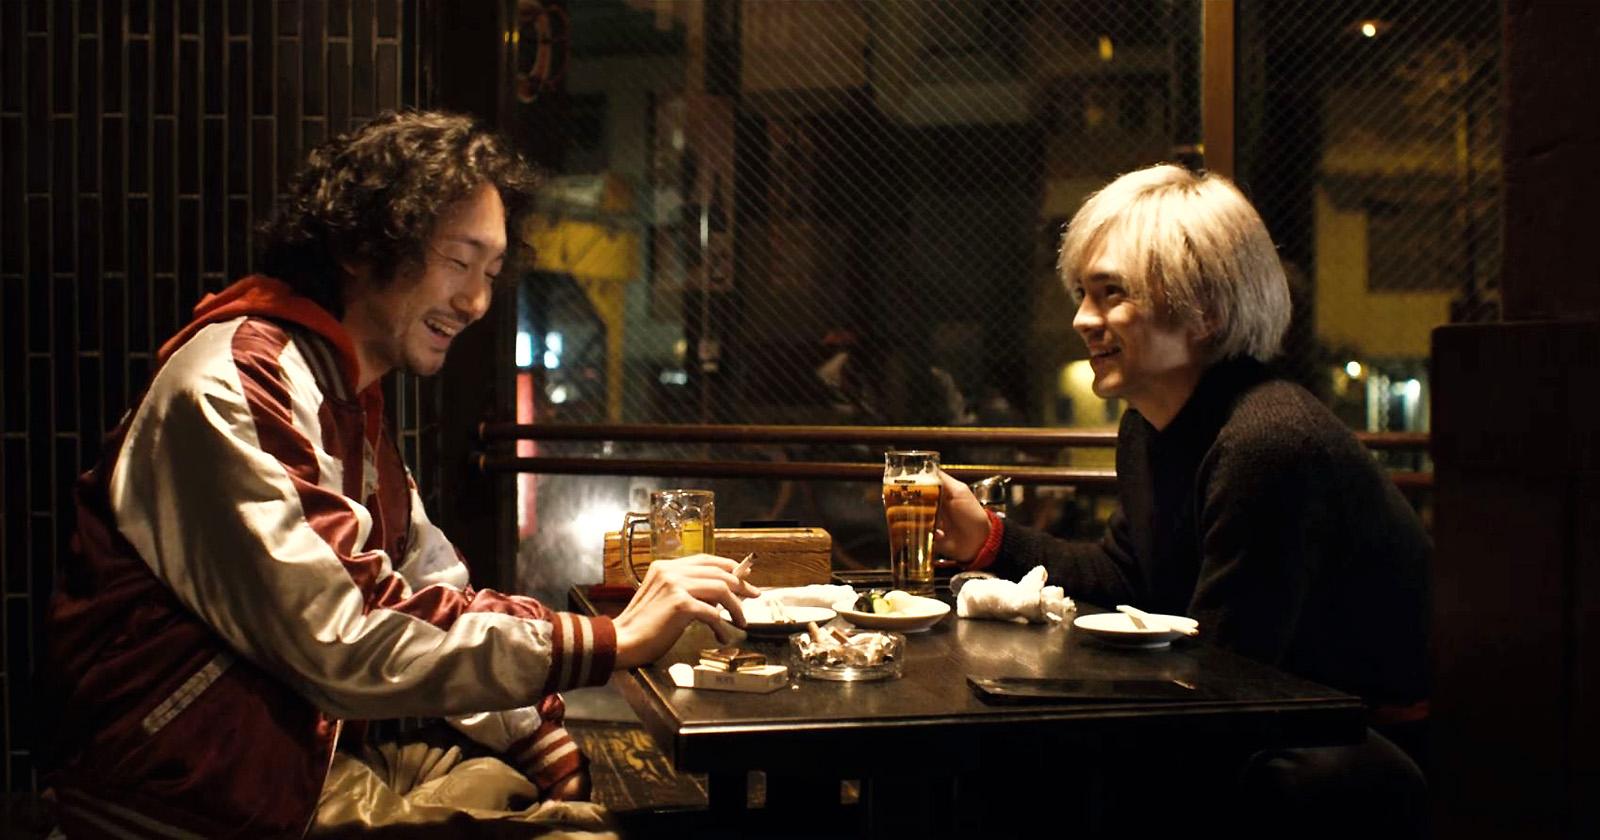 hibana-spark-english-translation-novel-manzai-comedy-naoki-matayoshi-literature-comedy